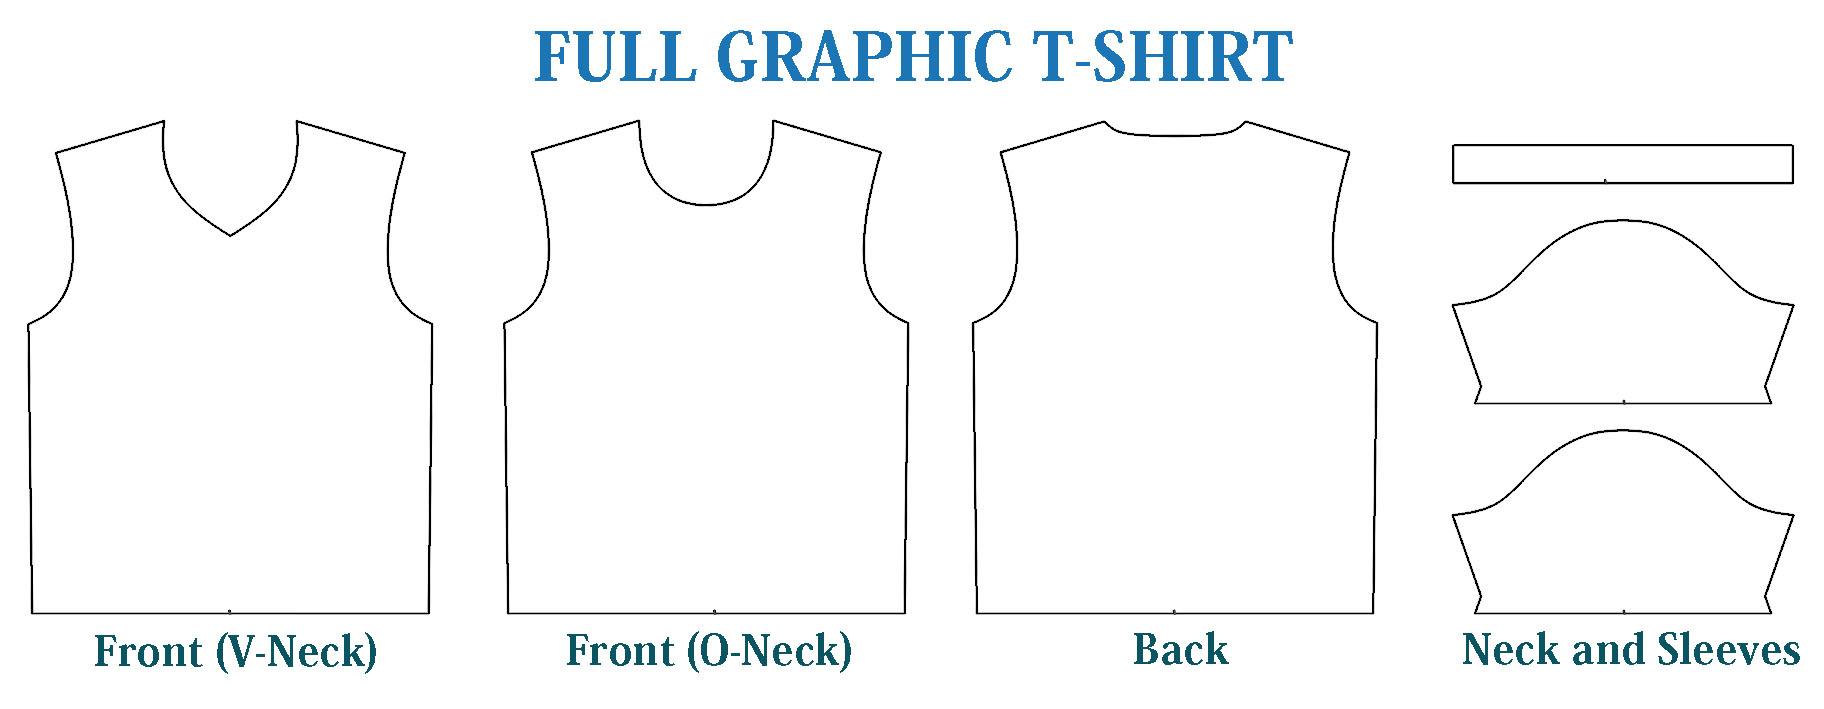 desc_fabrics_01_tshirts_EN.jpg